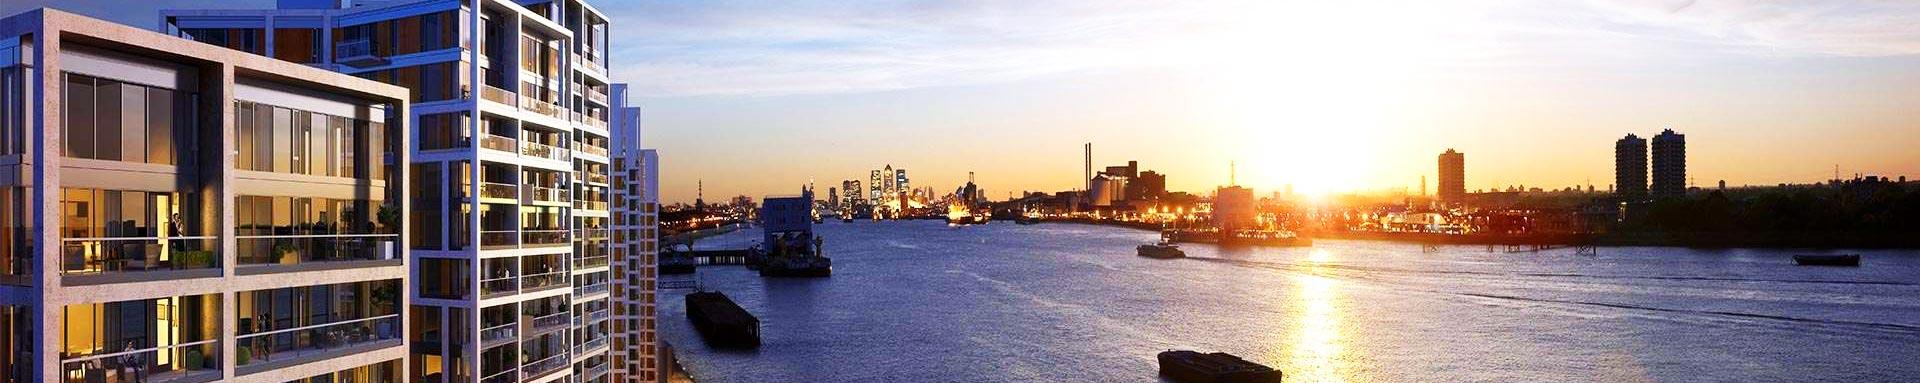 Royal Arsenal Riverside London - Apartments for Sale